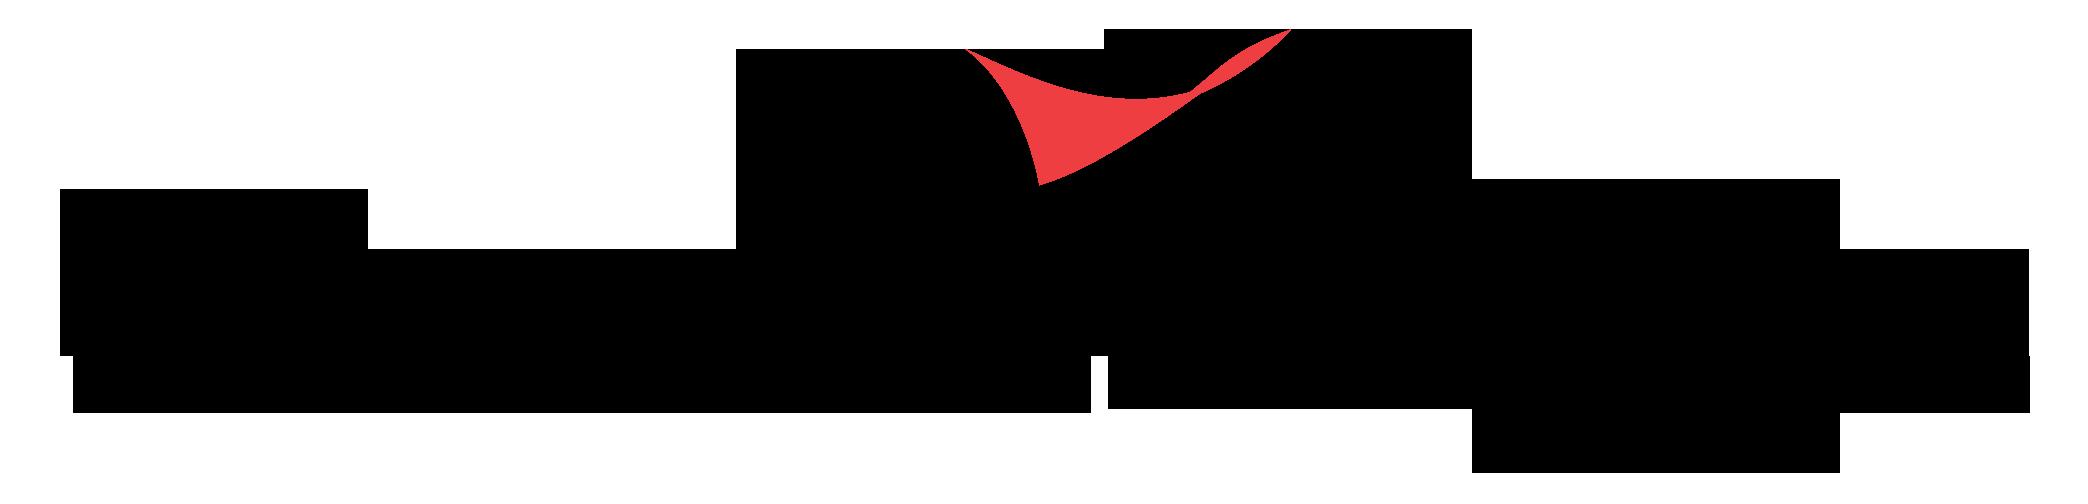 Conocophillips Logo PNG - 39809